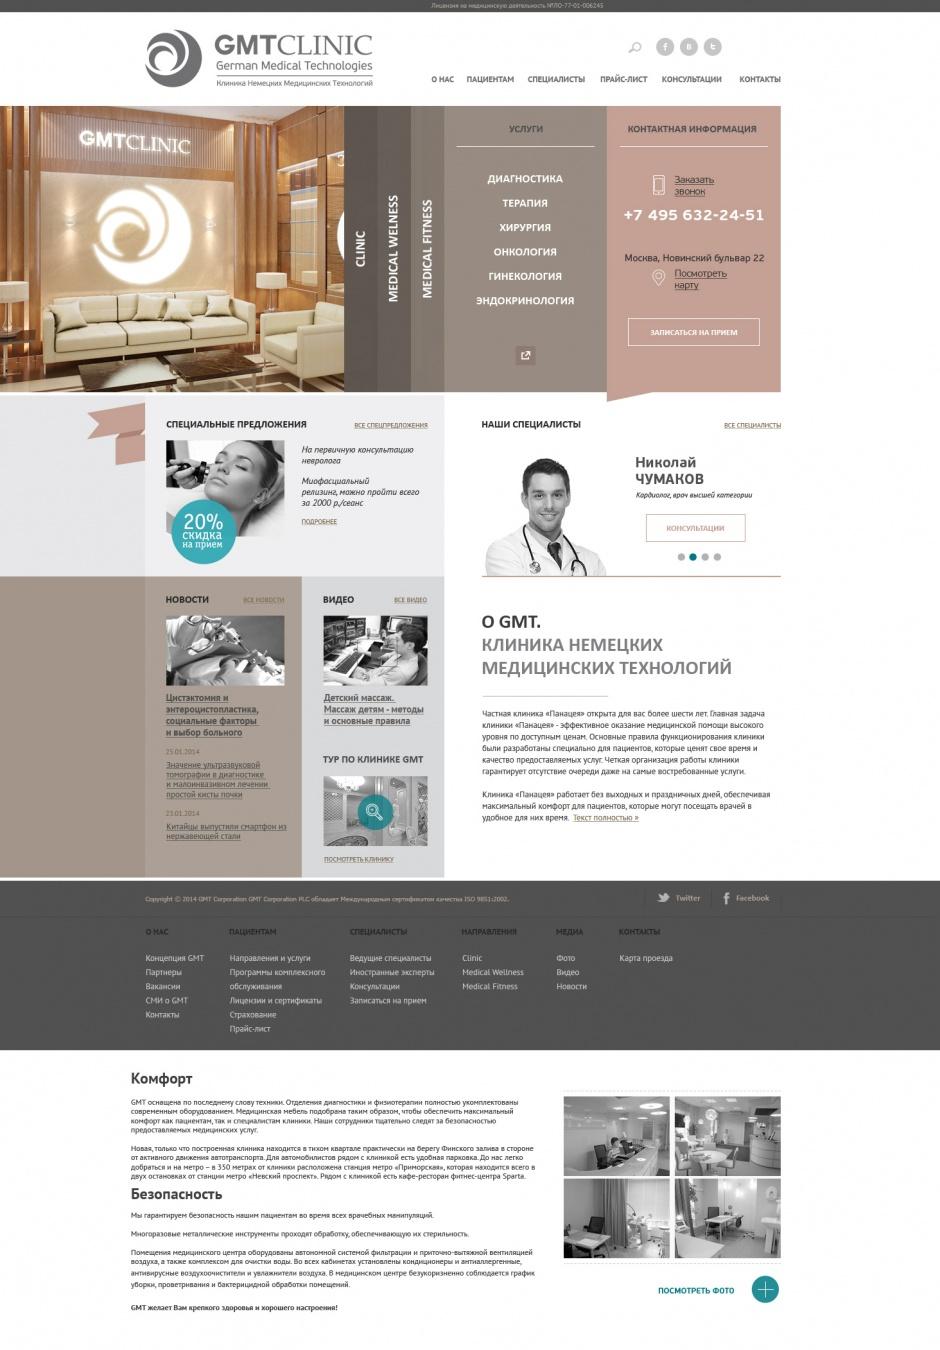 дизайн сайта GMT Clinic - главная страница